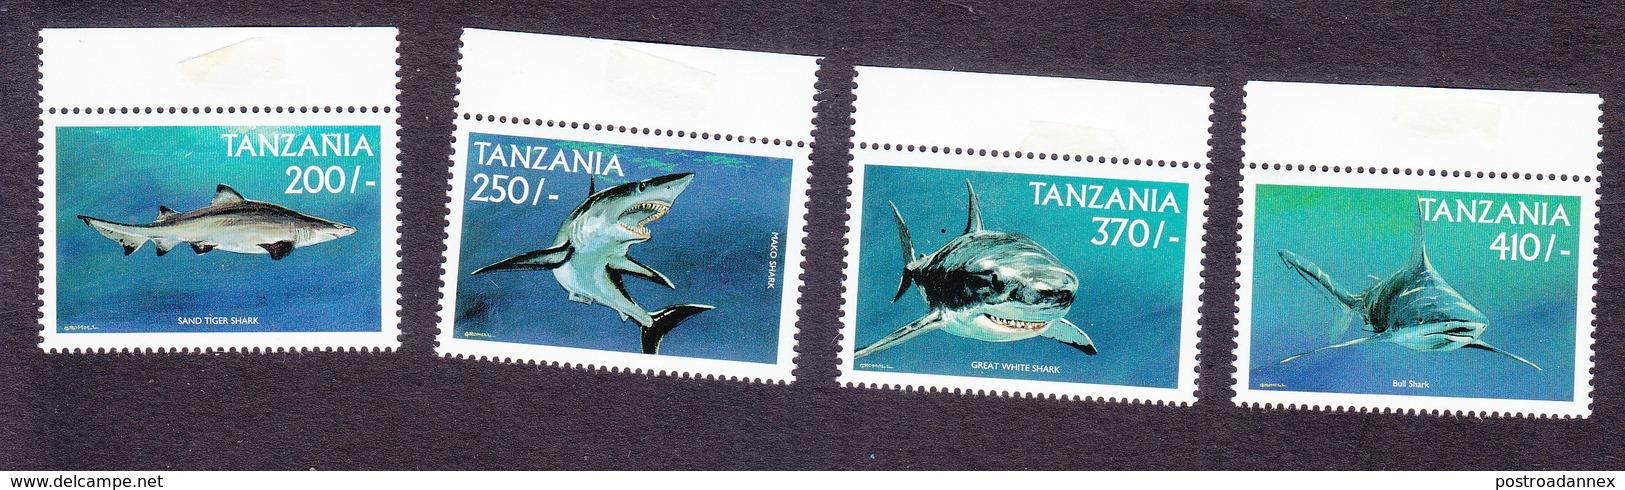 Tanzania, Scott #1881-1884, Mint Never Hinged, Sharks, Issued 1999 - Tanzania (1964-...)